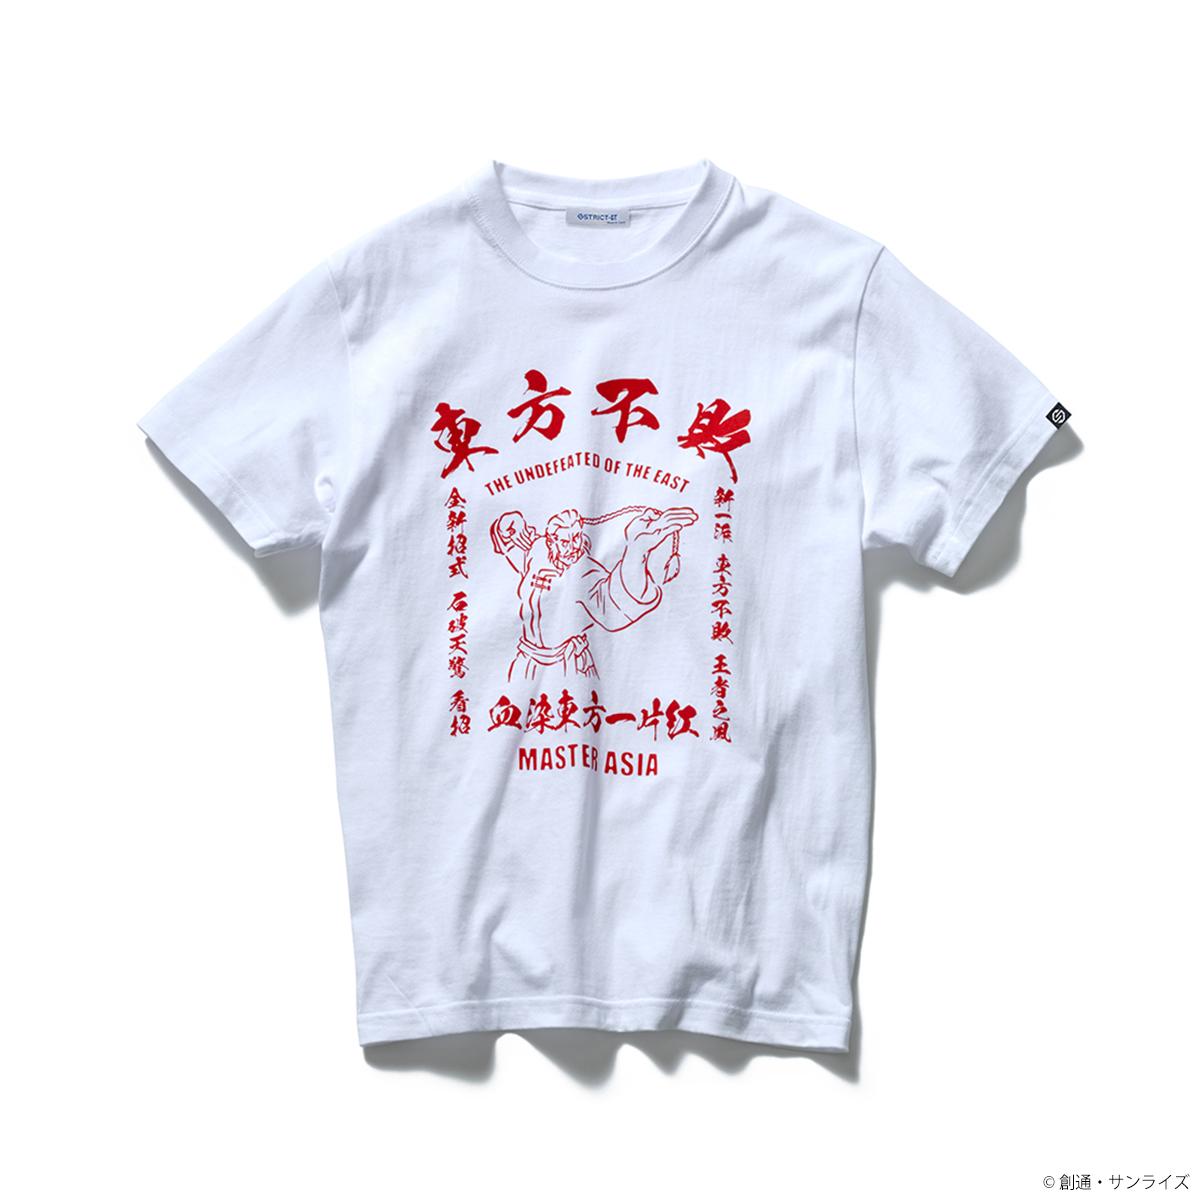 STRICT-G『機動武闘伝Gガンダム』 Tシャツ MASTER ASIA